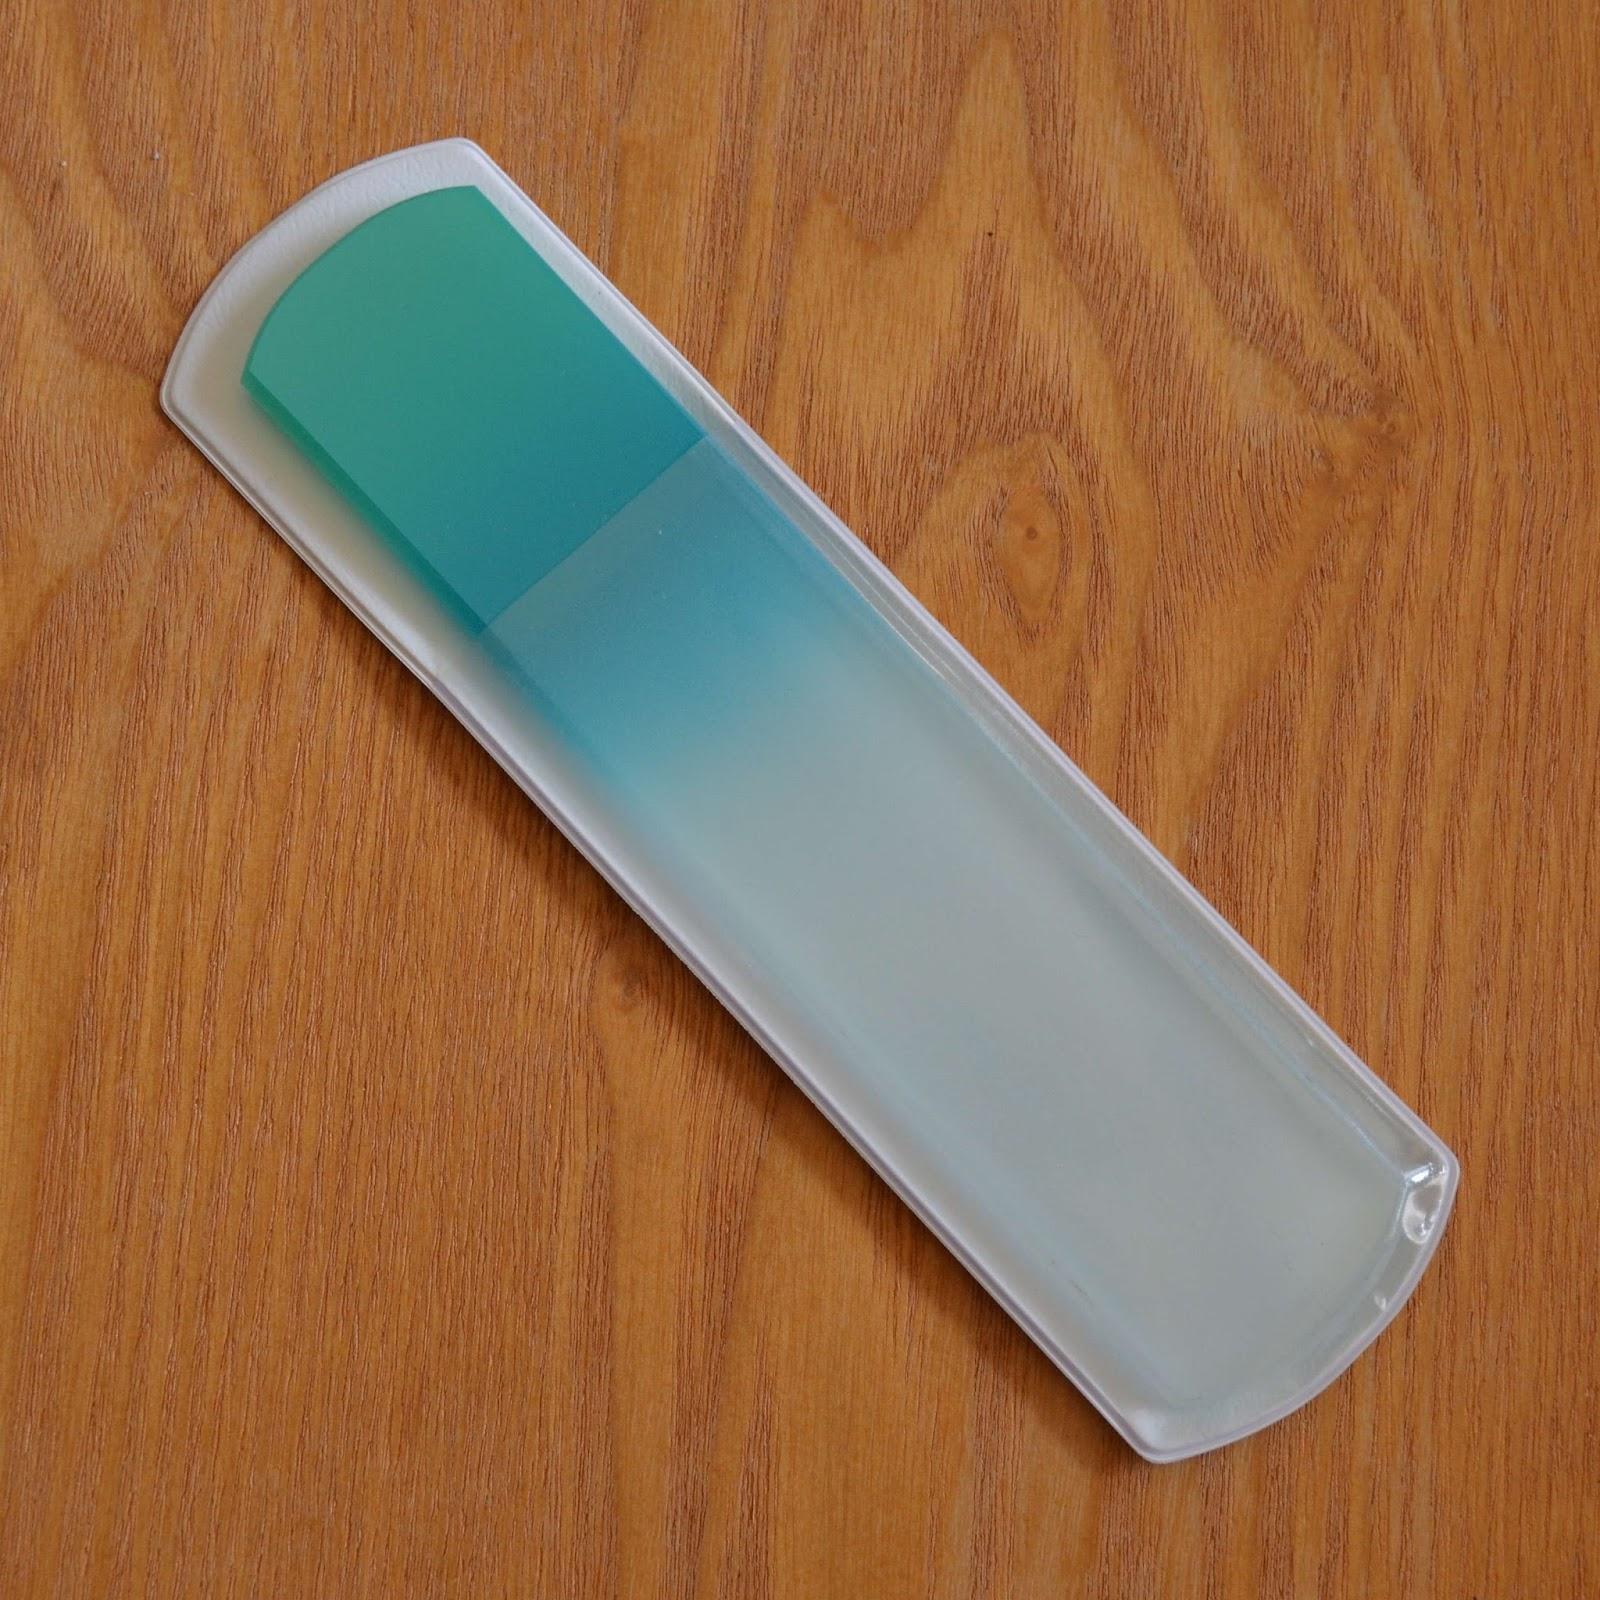 Polished Lifting: Aveniro Glass Nail File Review